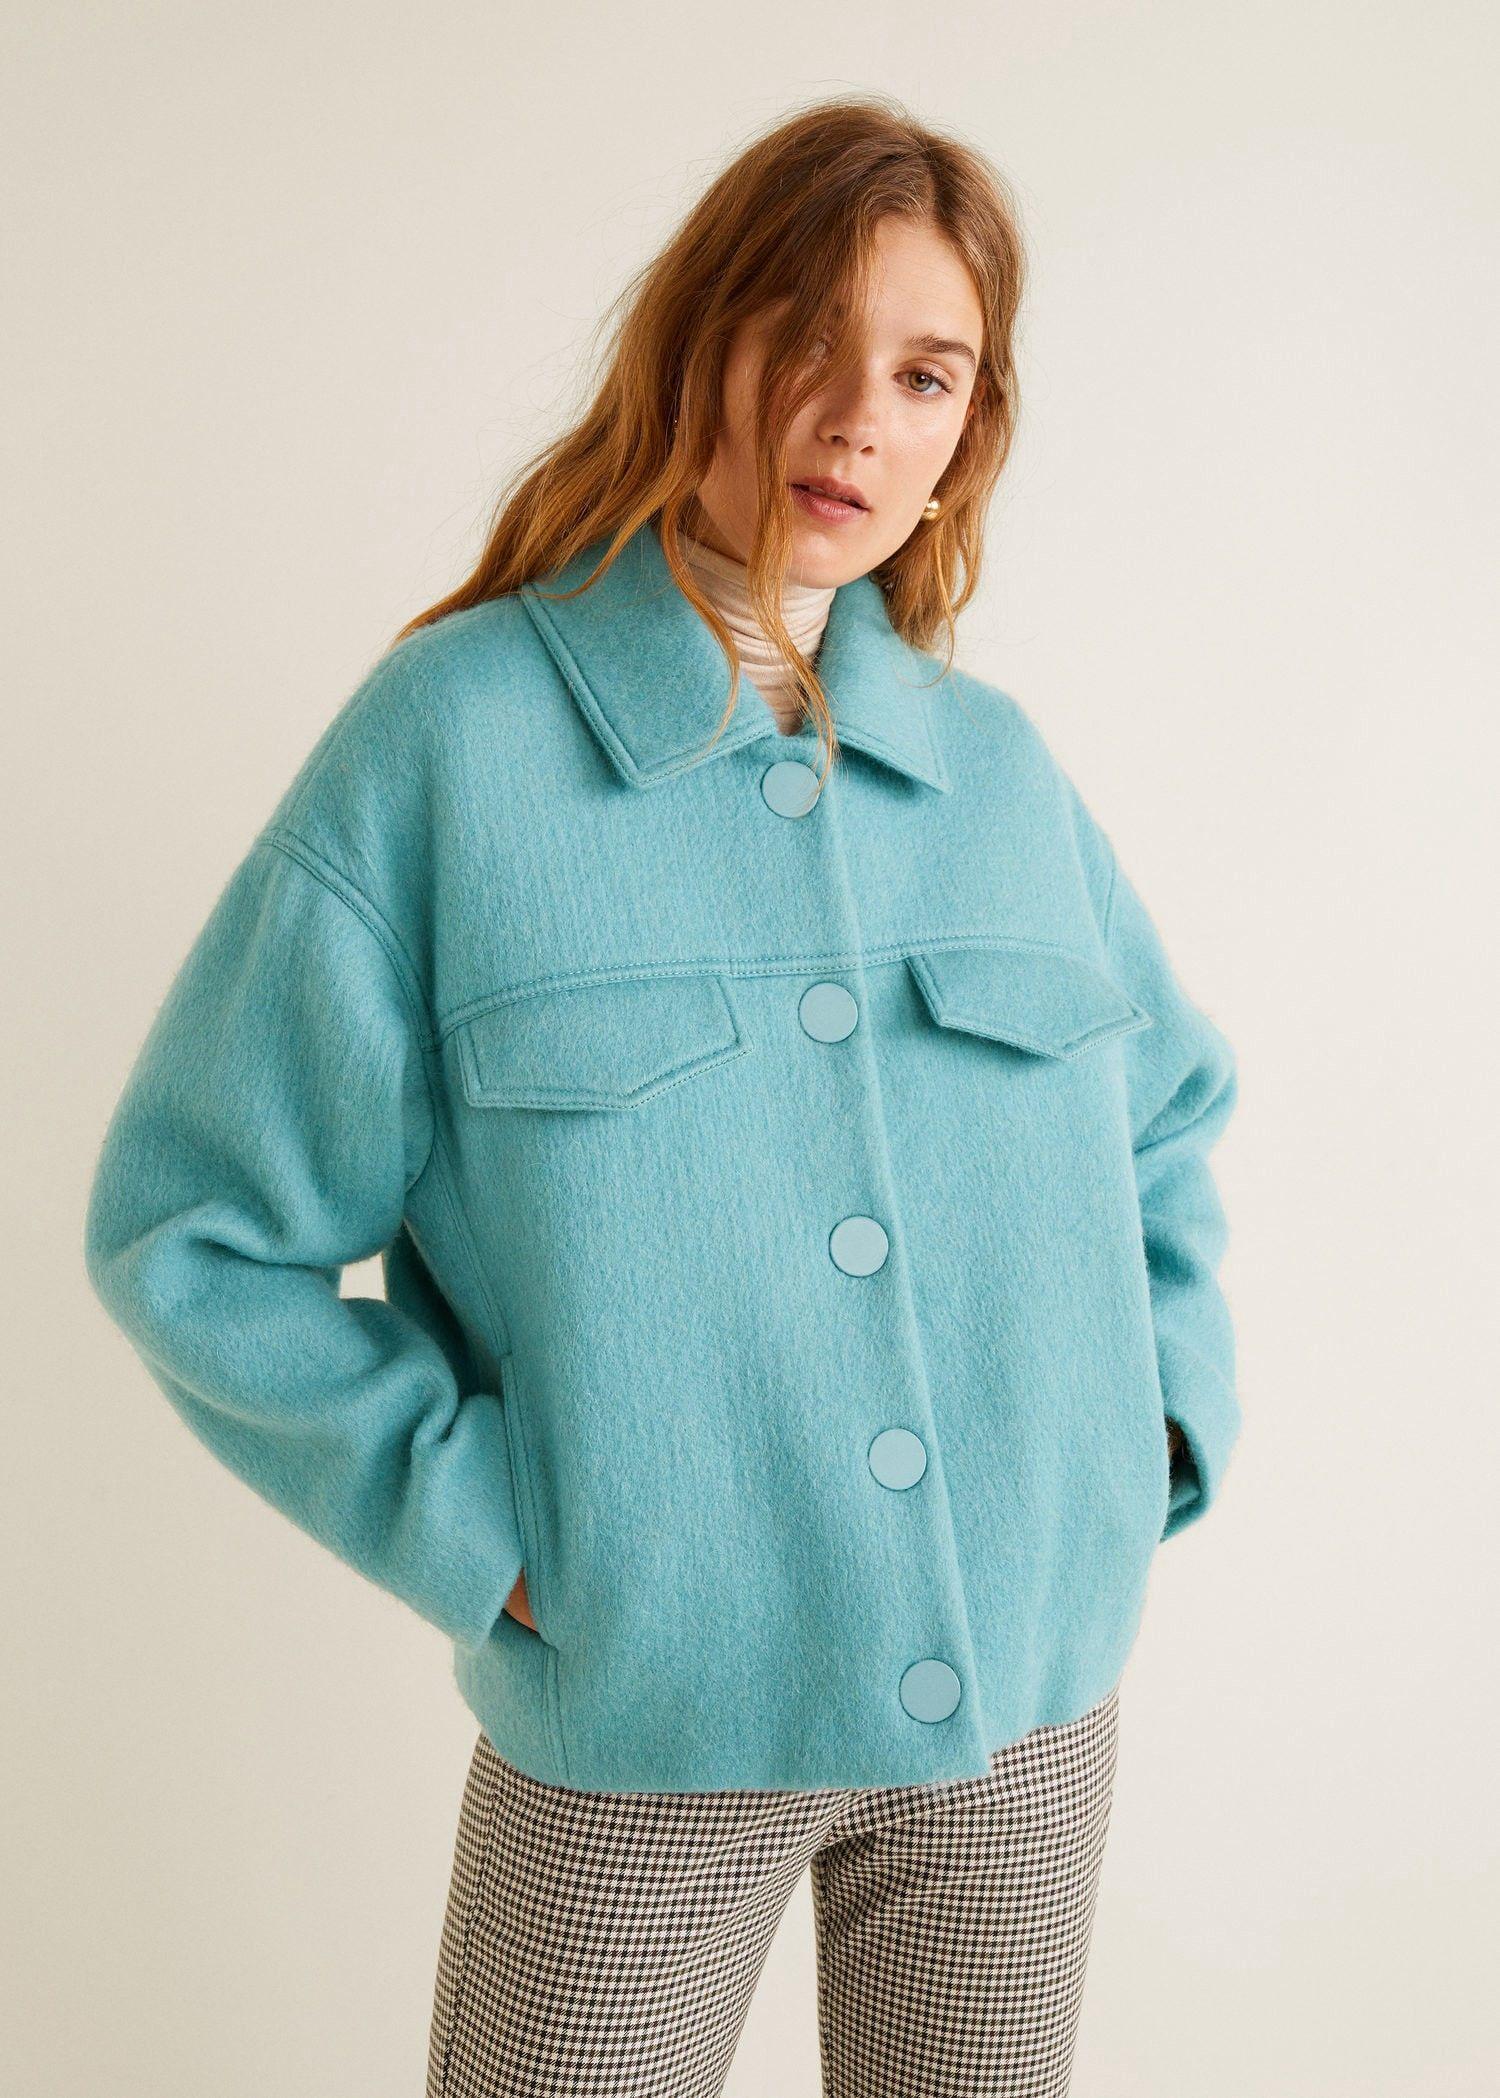 9e1cfa376c499 Mango Buttoned Wool Jacket - Grey Xs | Products | Jacket buttons ...